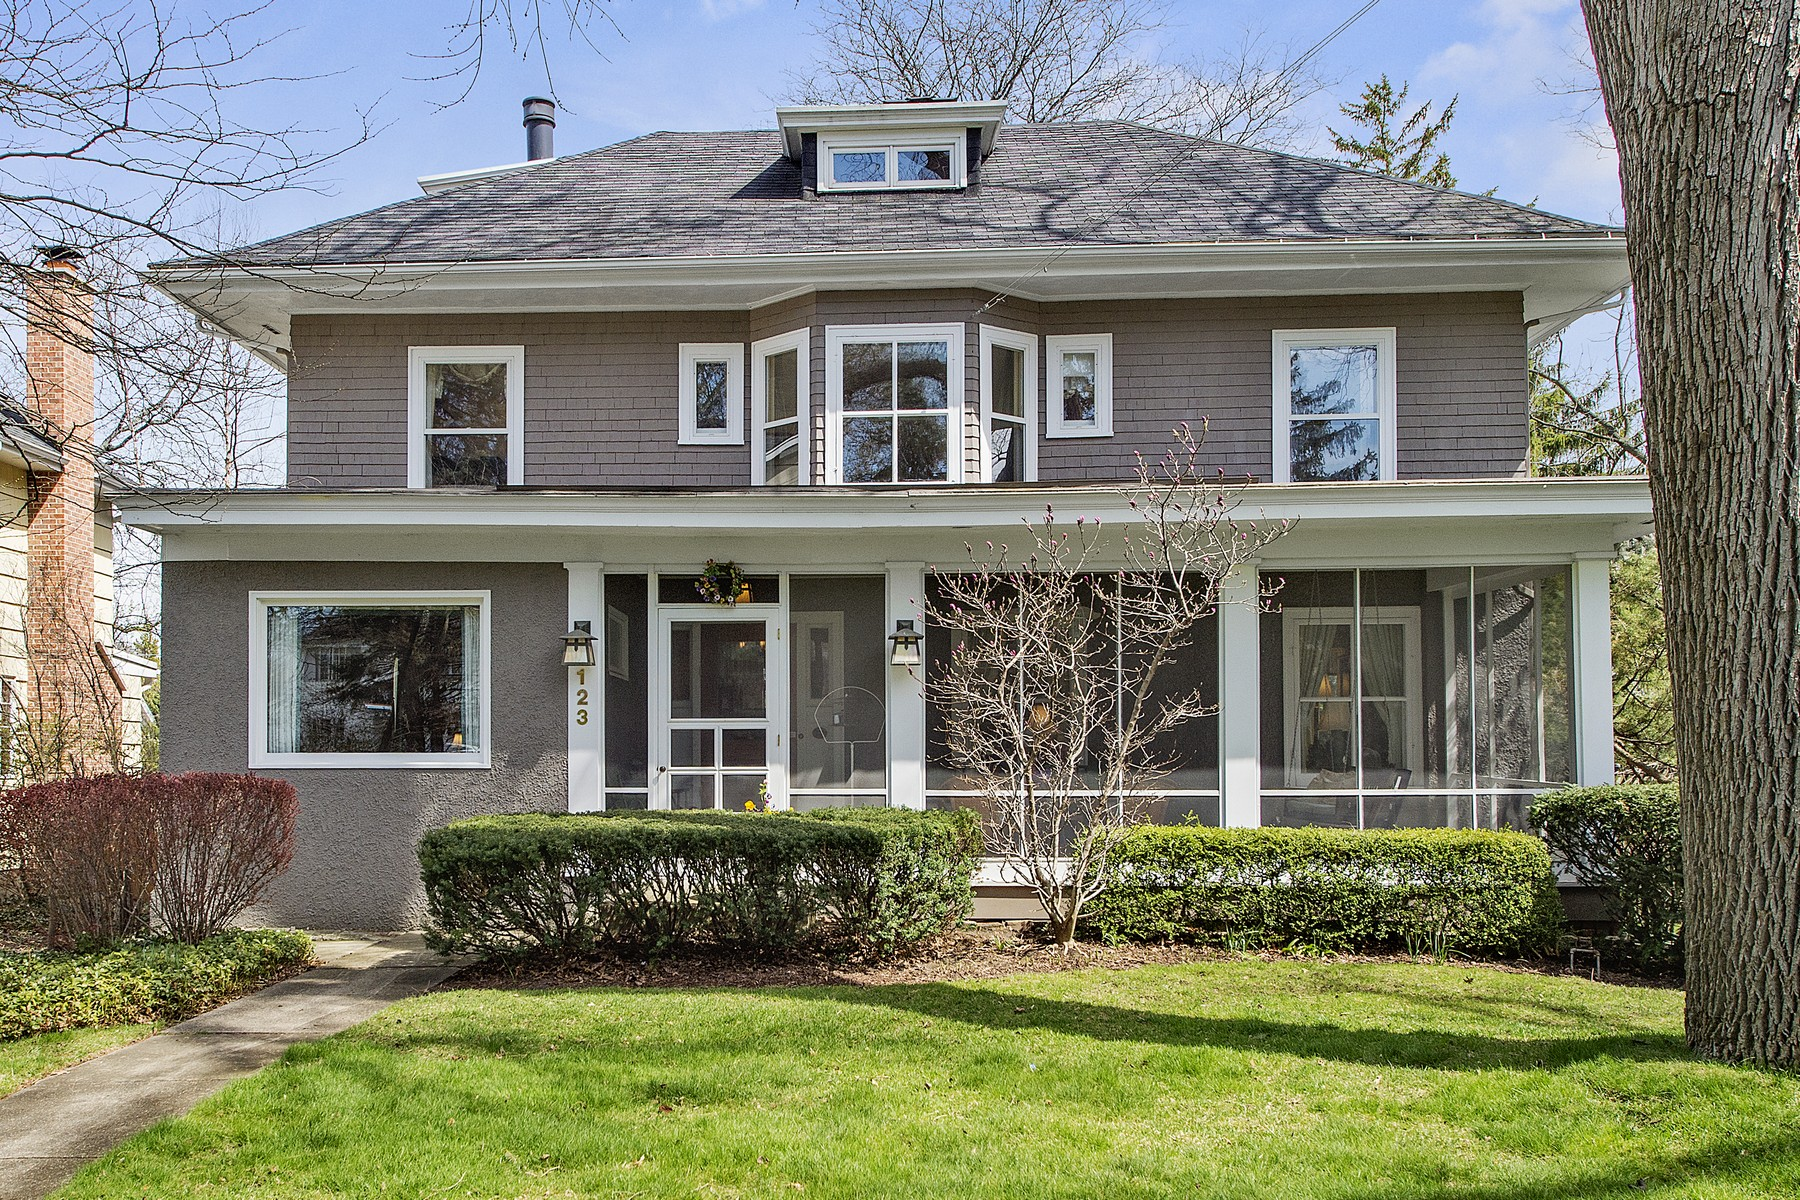 Single Family Home for Sale at 123 N. Washington Hinsdale, Illinois, 60521 United States